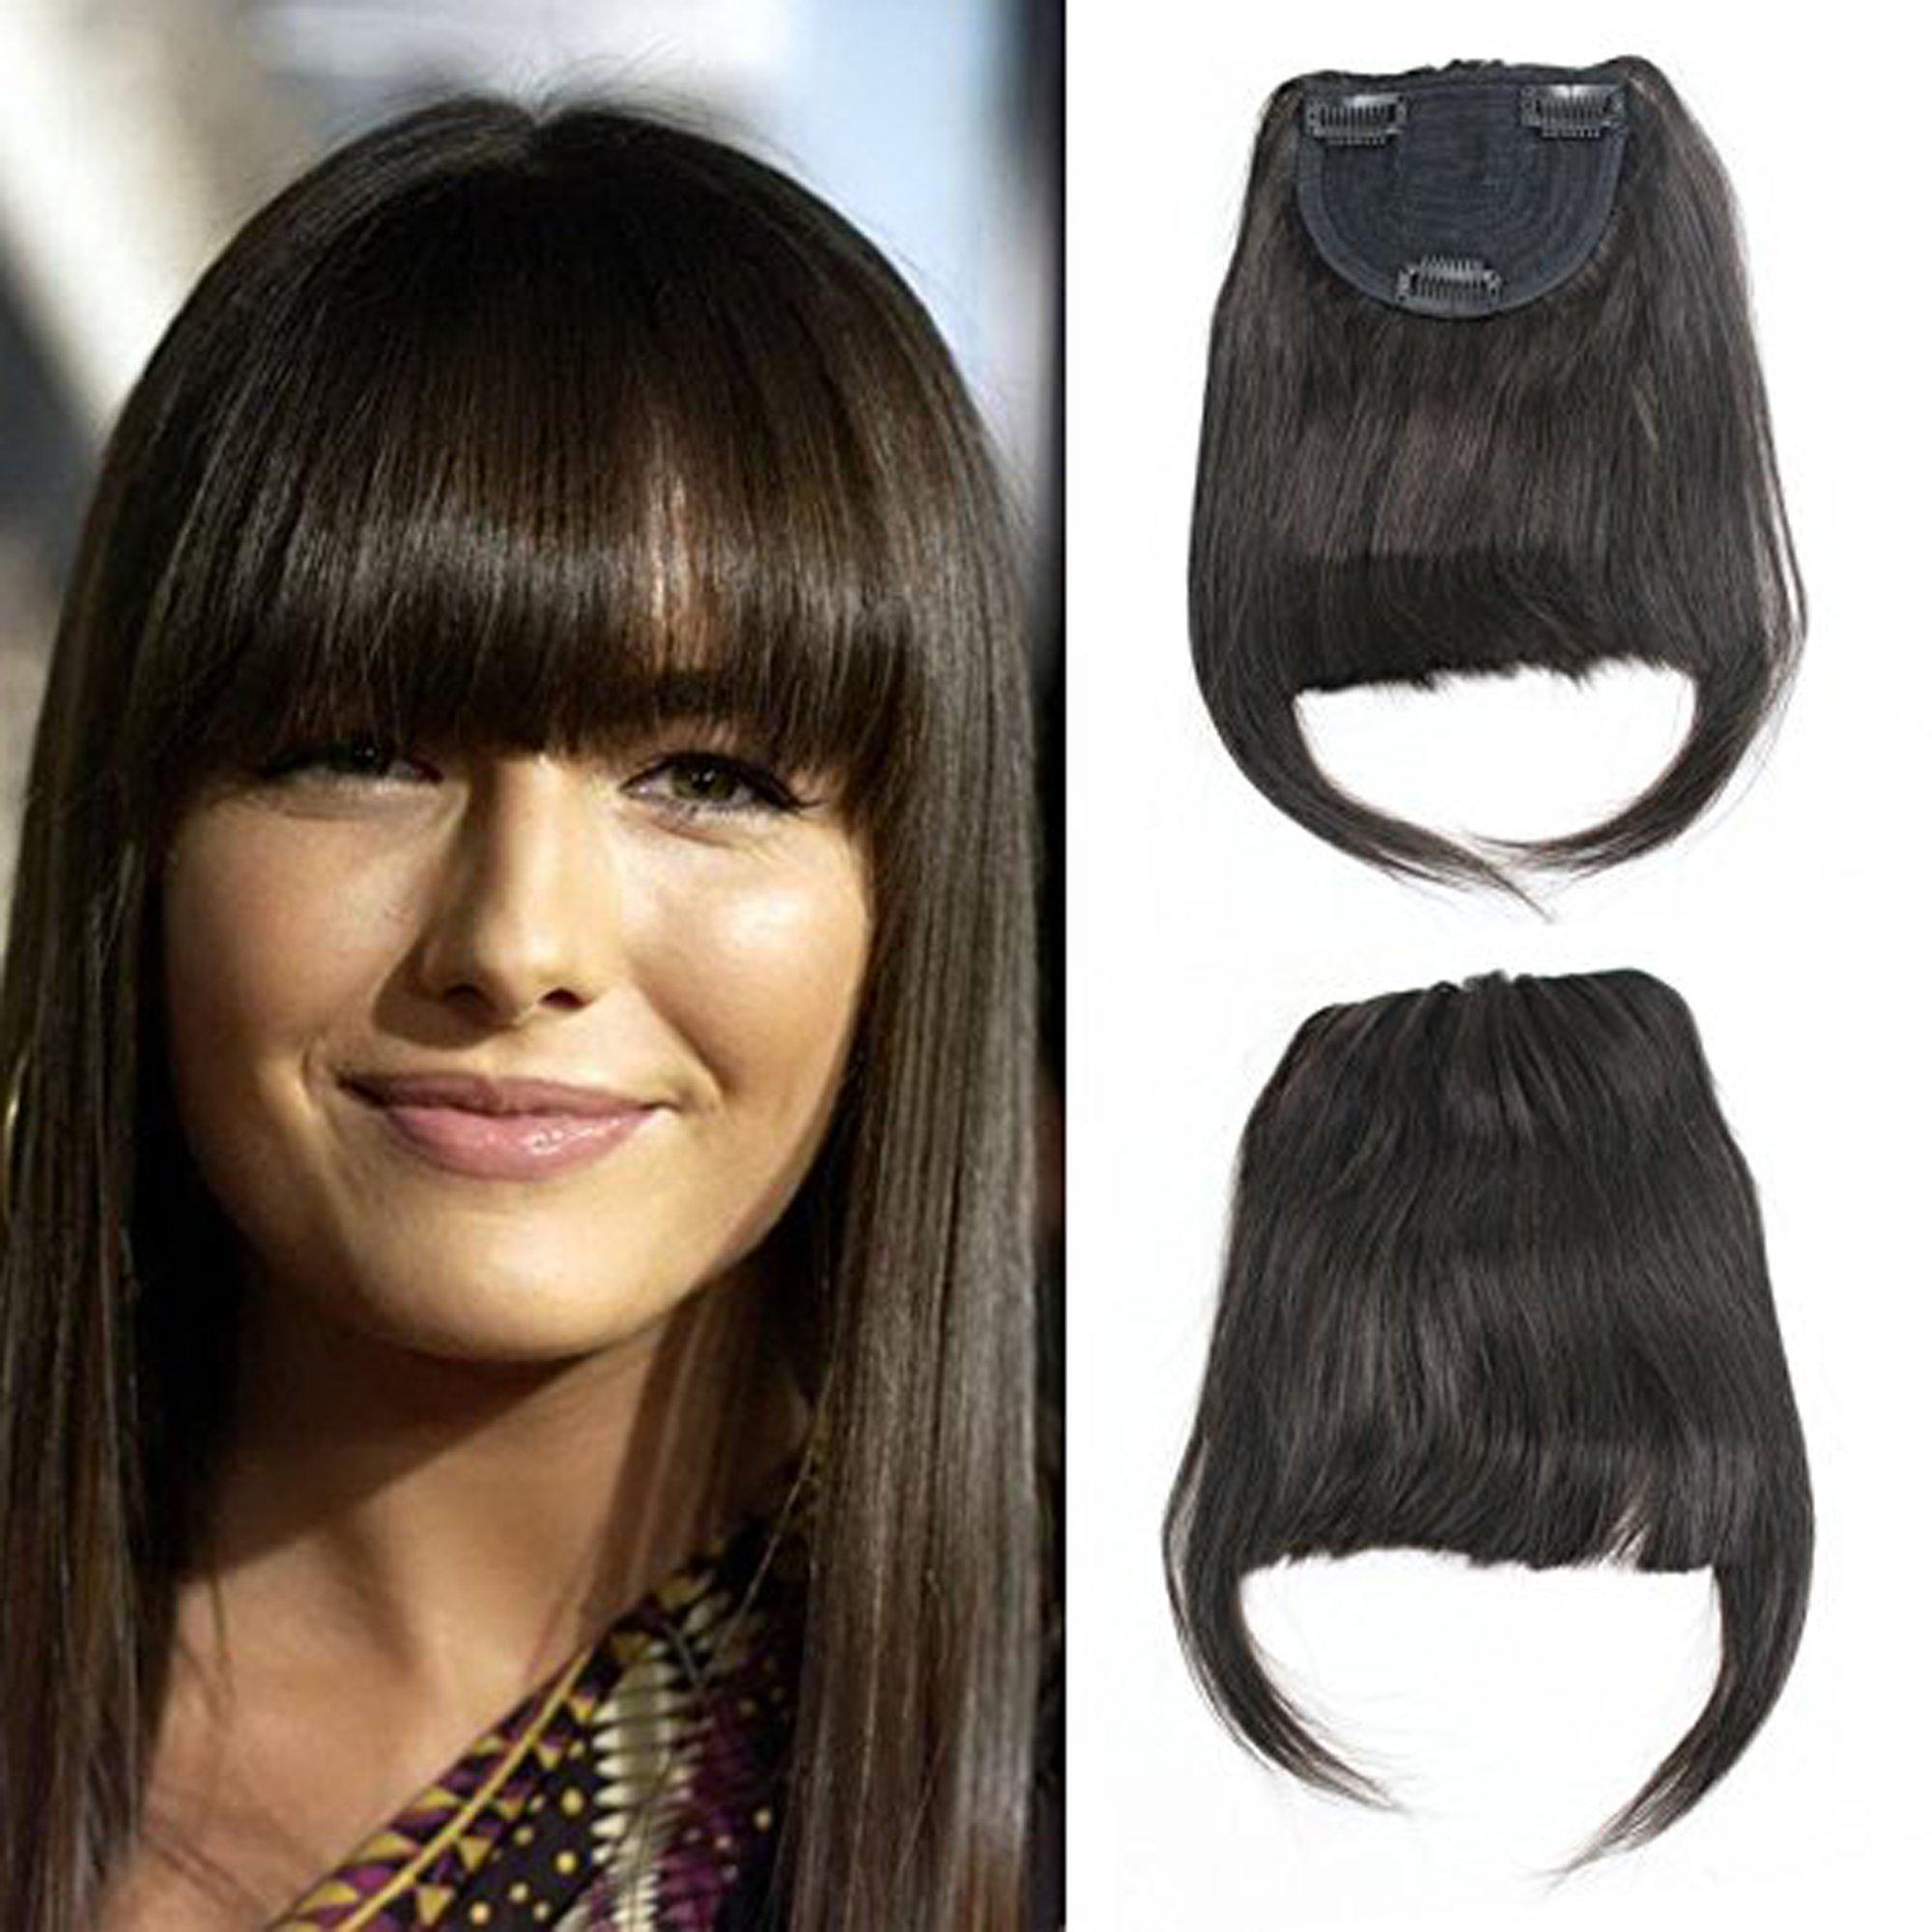 Luxwig Brazilian Human Hair Clip-in Hair Bang Fringe Short Straight Hair Extension for Black Women 6-8inch